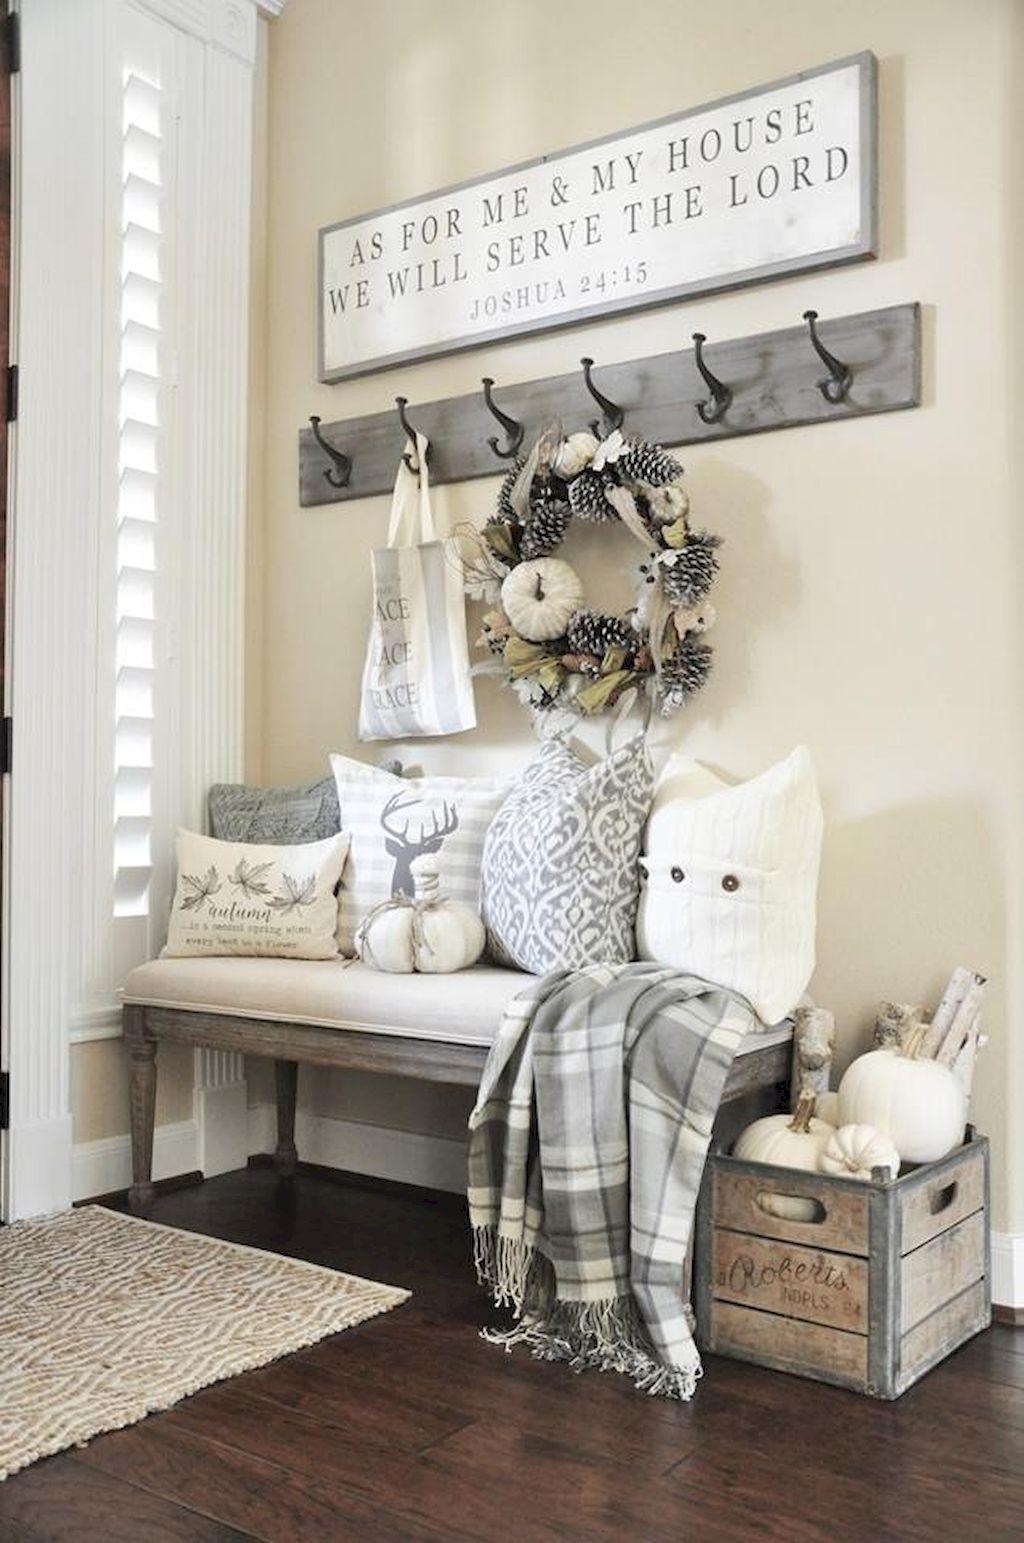 50 Farmhouse Mudroom Bench Decorating Ideas Home decor